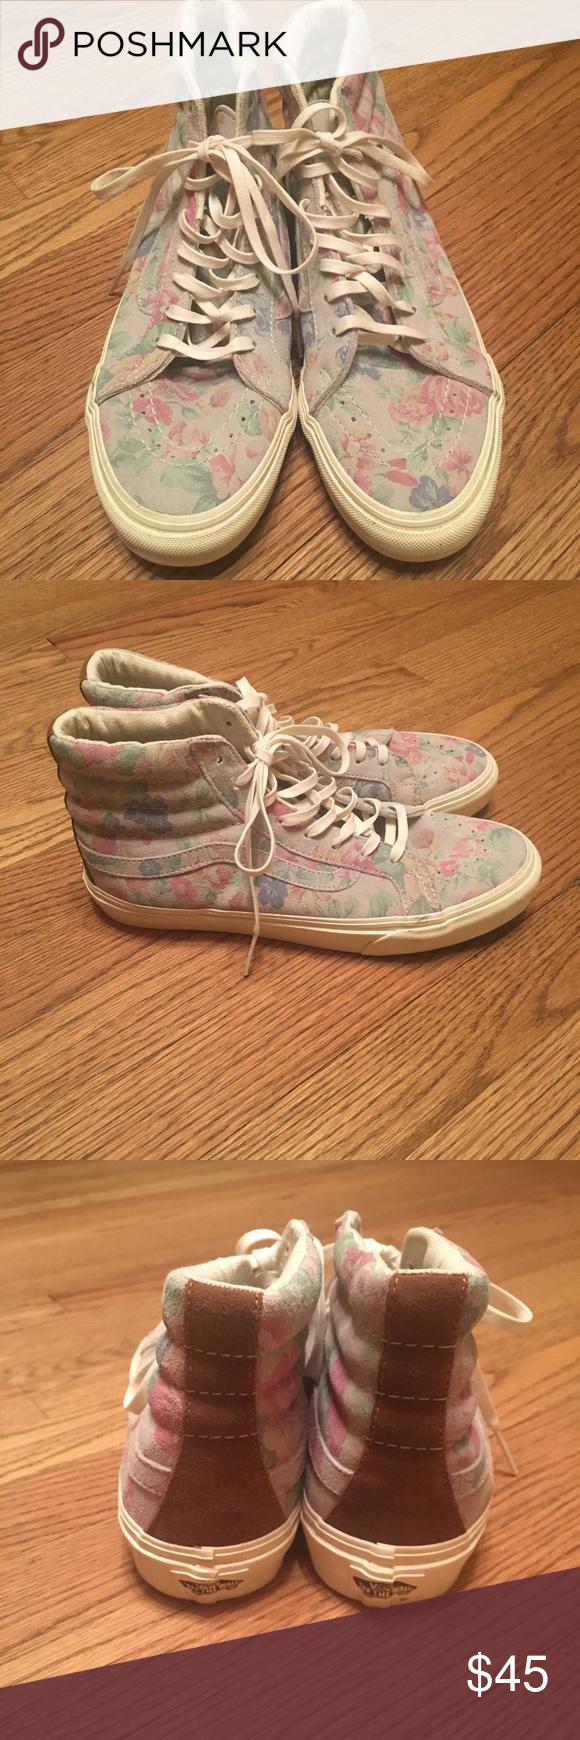 dcdf60f84d Vans Womens SK8 Hi Slim Suede Floral Marshmallow Worn Twice. Size 8.5 Vans  Shoes Sneakers